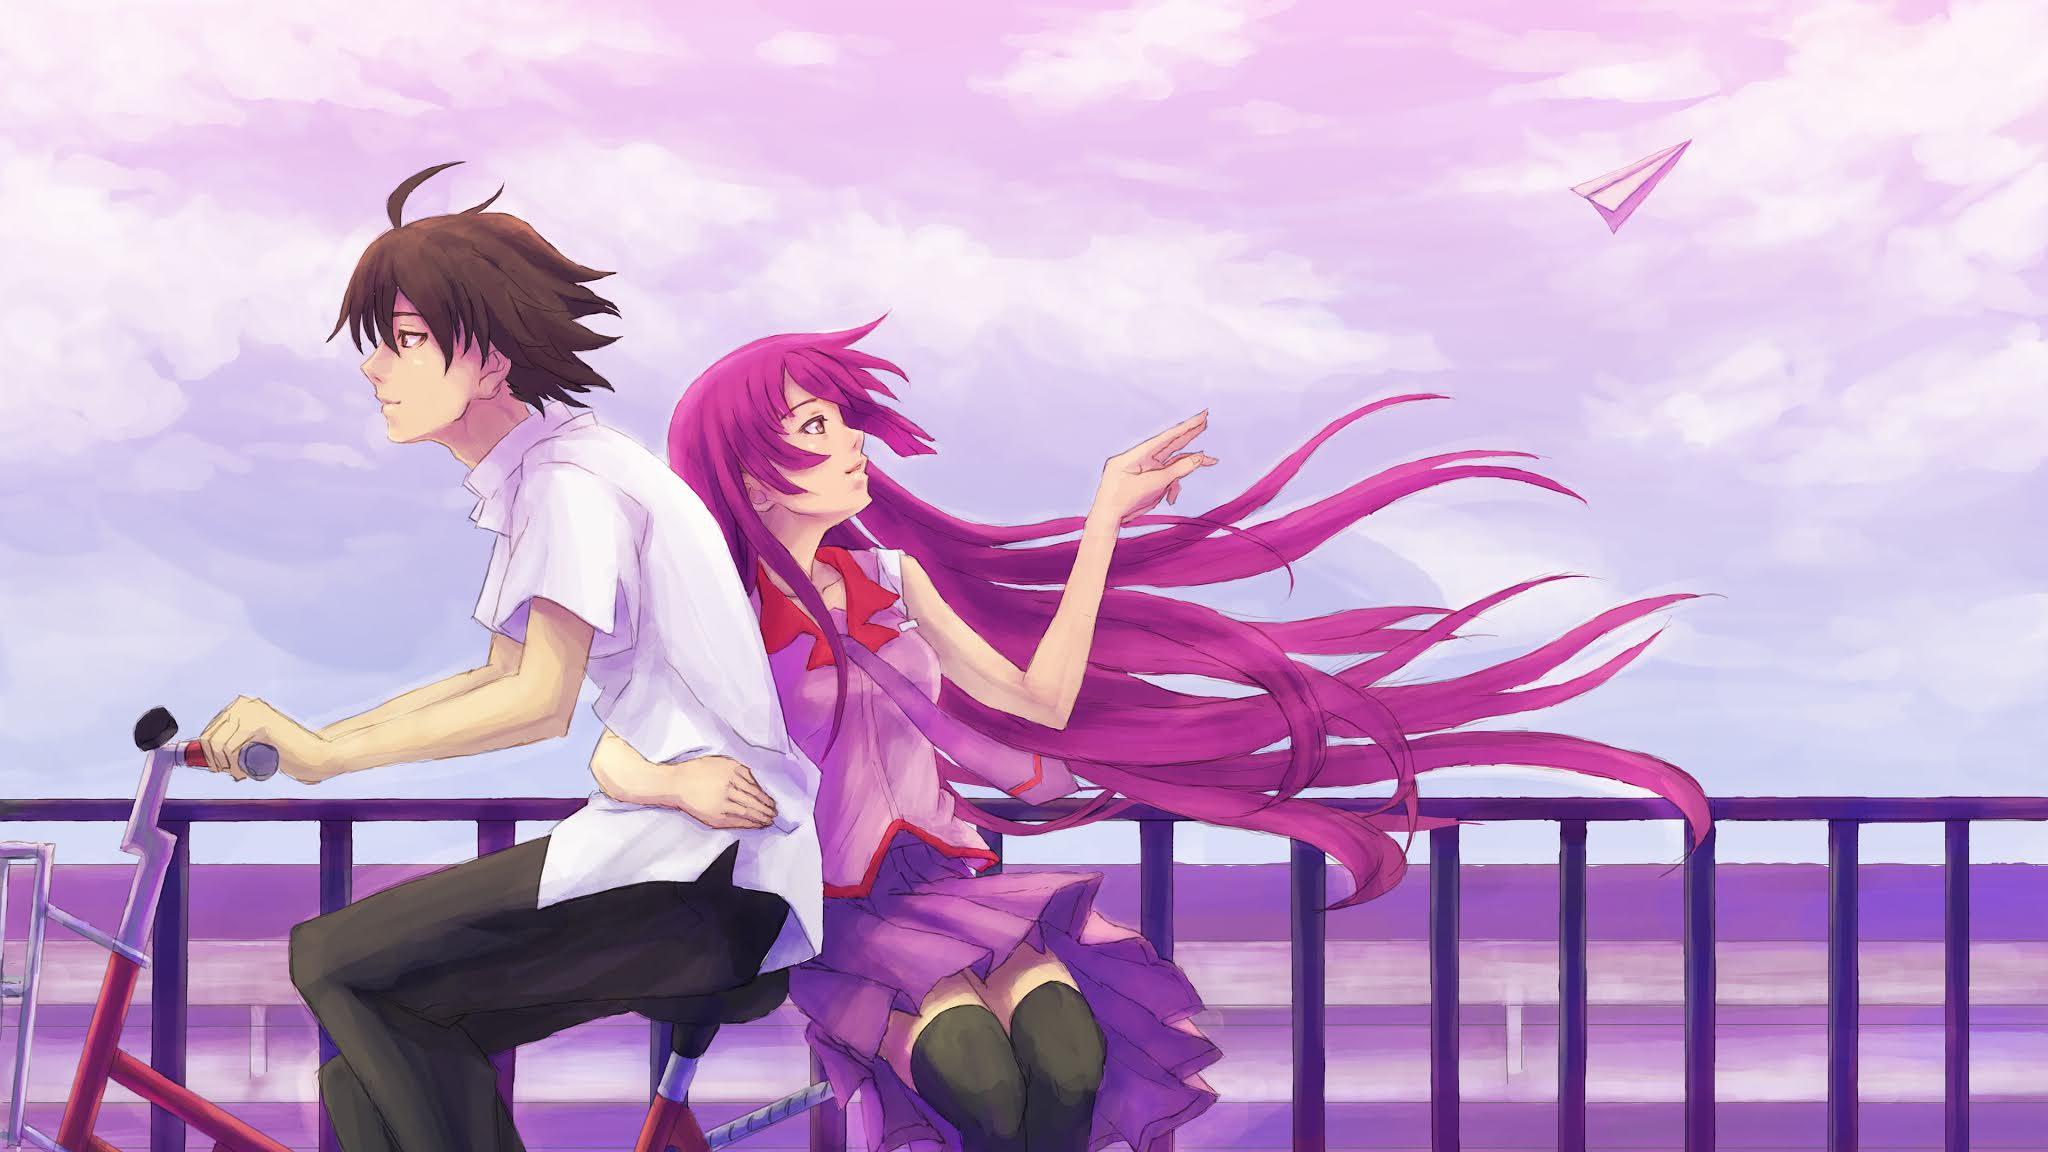 Cute Anime Couple Wallpaper